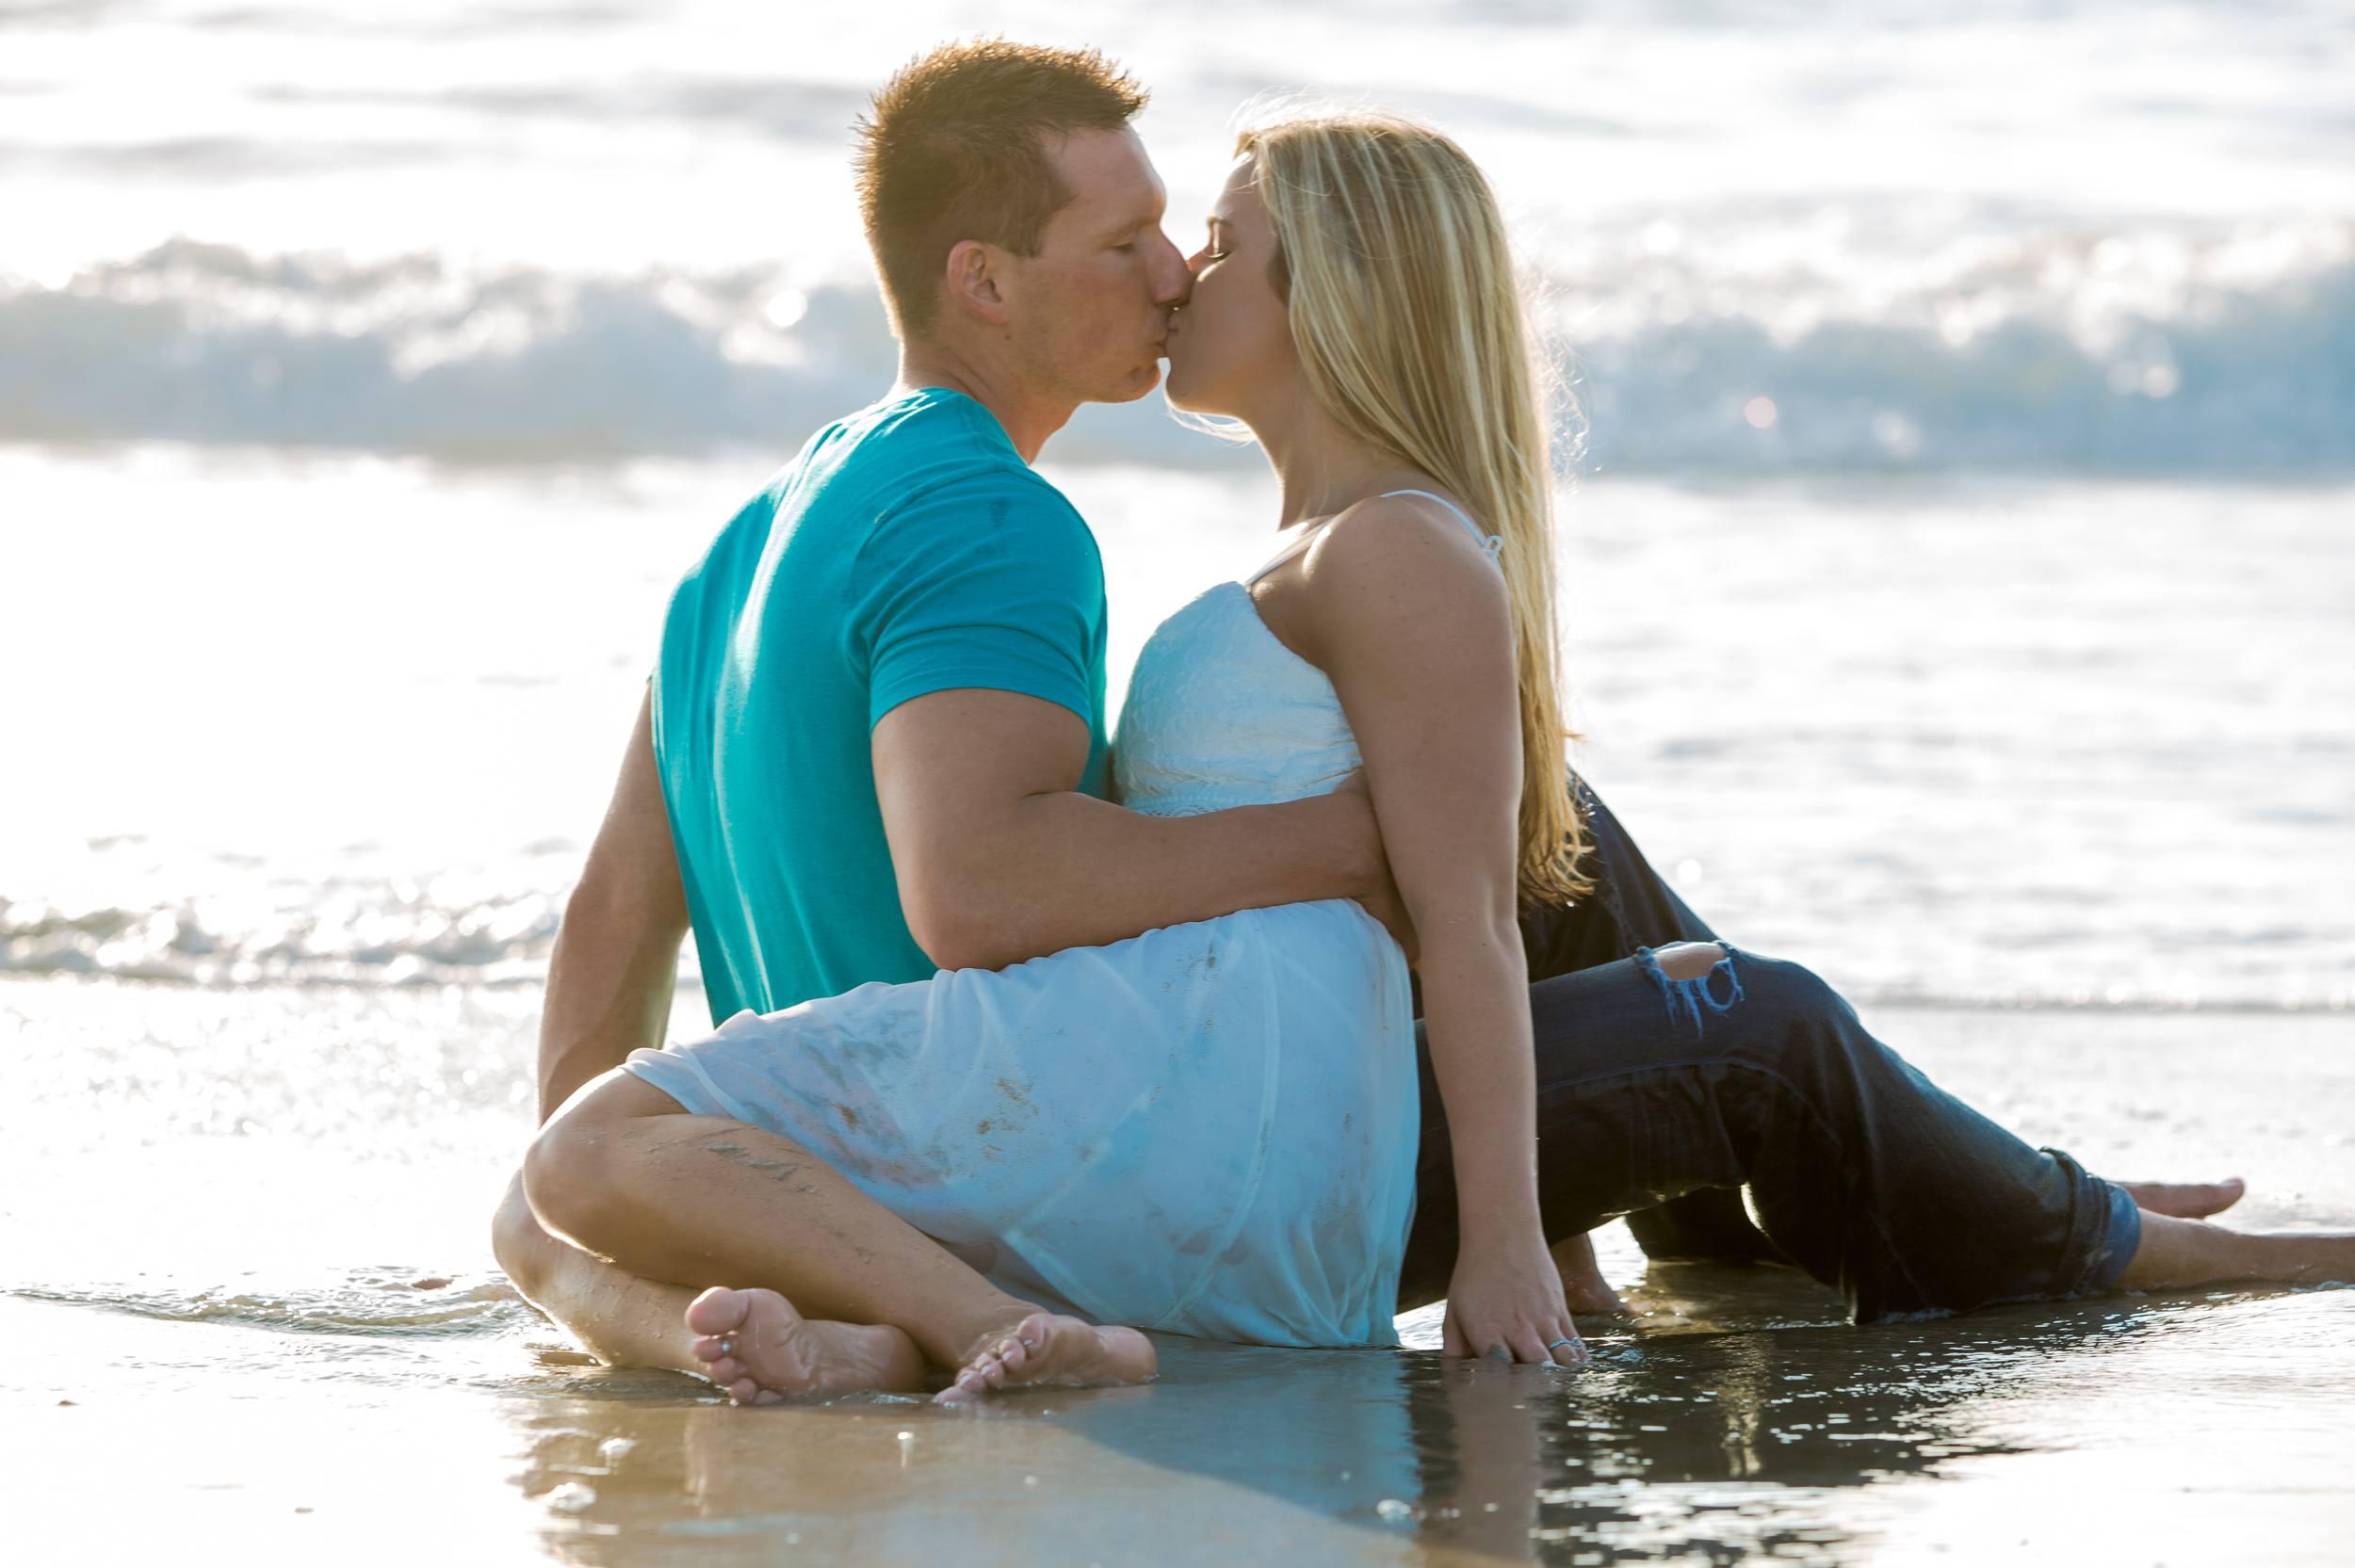 Lori Wilson Park Cocoa Beach Sunrise Engagement Session Mint Green dress- Bri 16.jpg